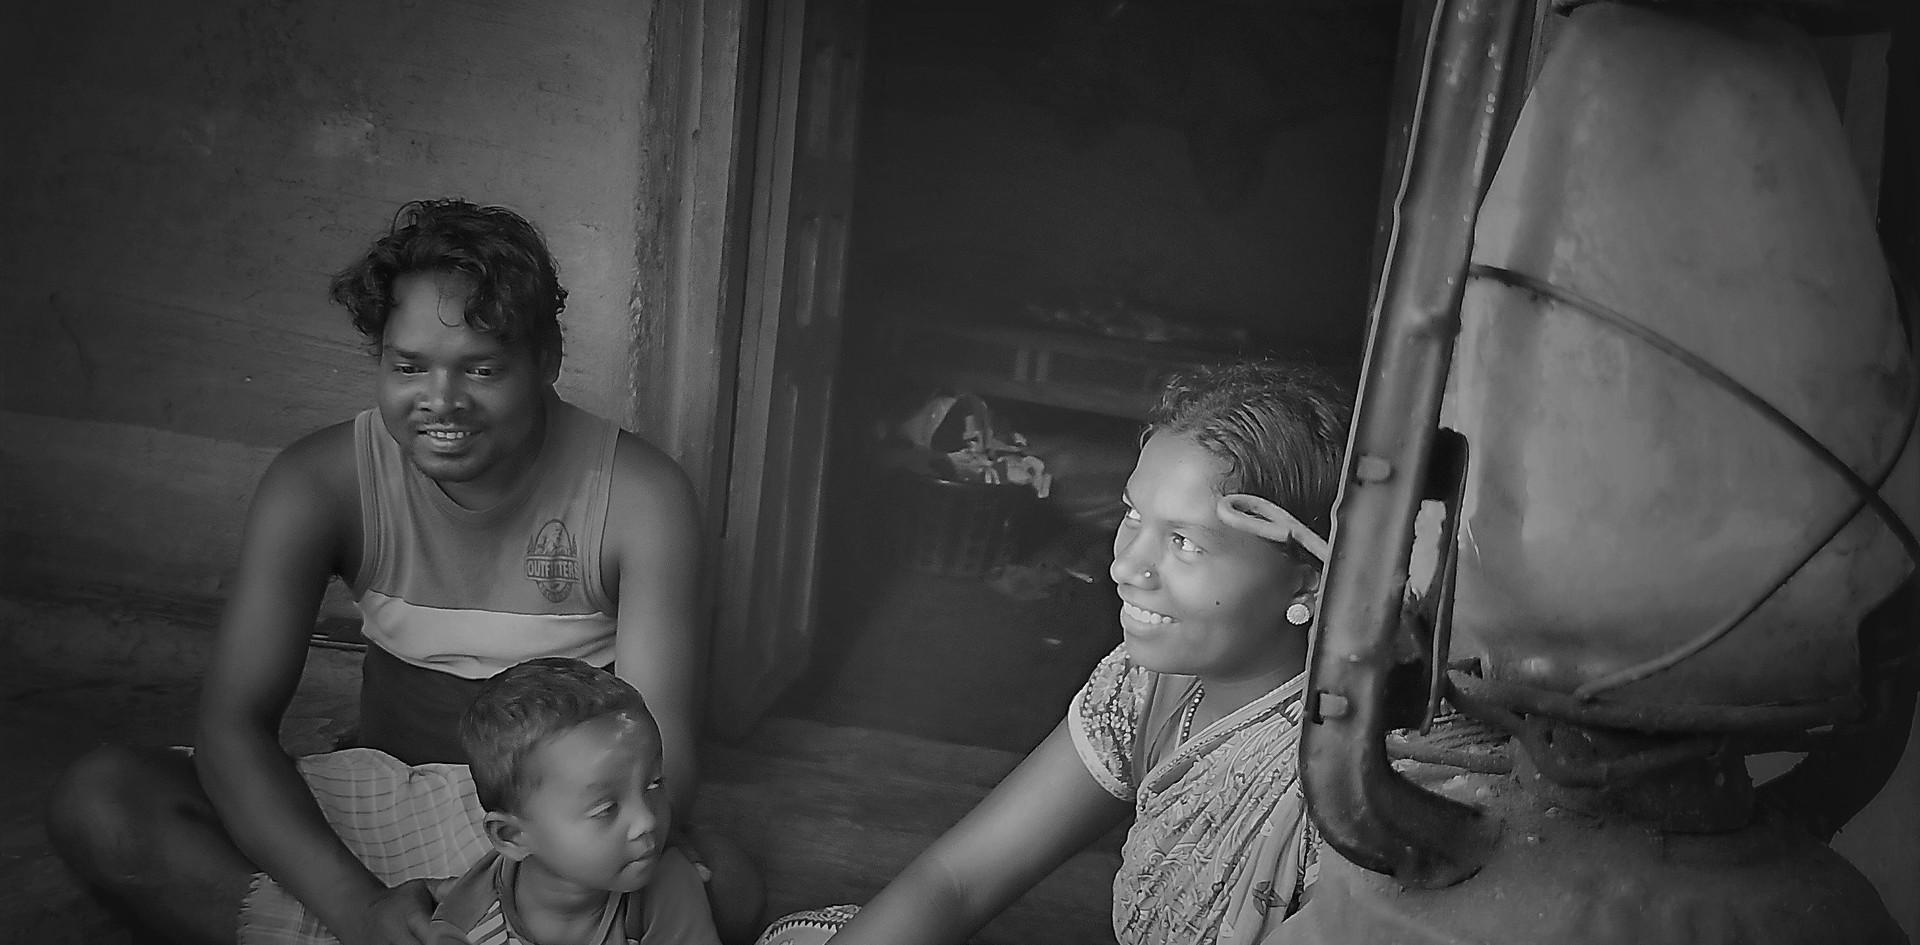 Early Childhood Development- Nurturing Child During Lock down - ©Prabhas Kumar Sahoo